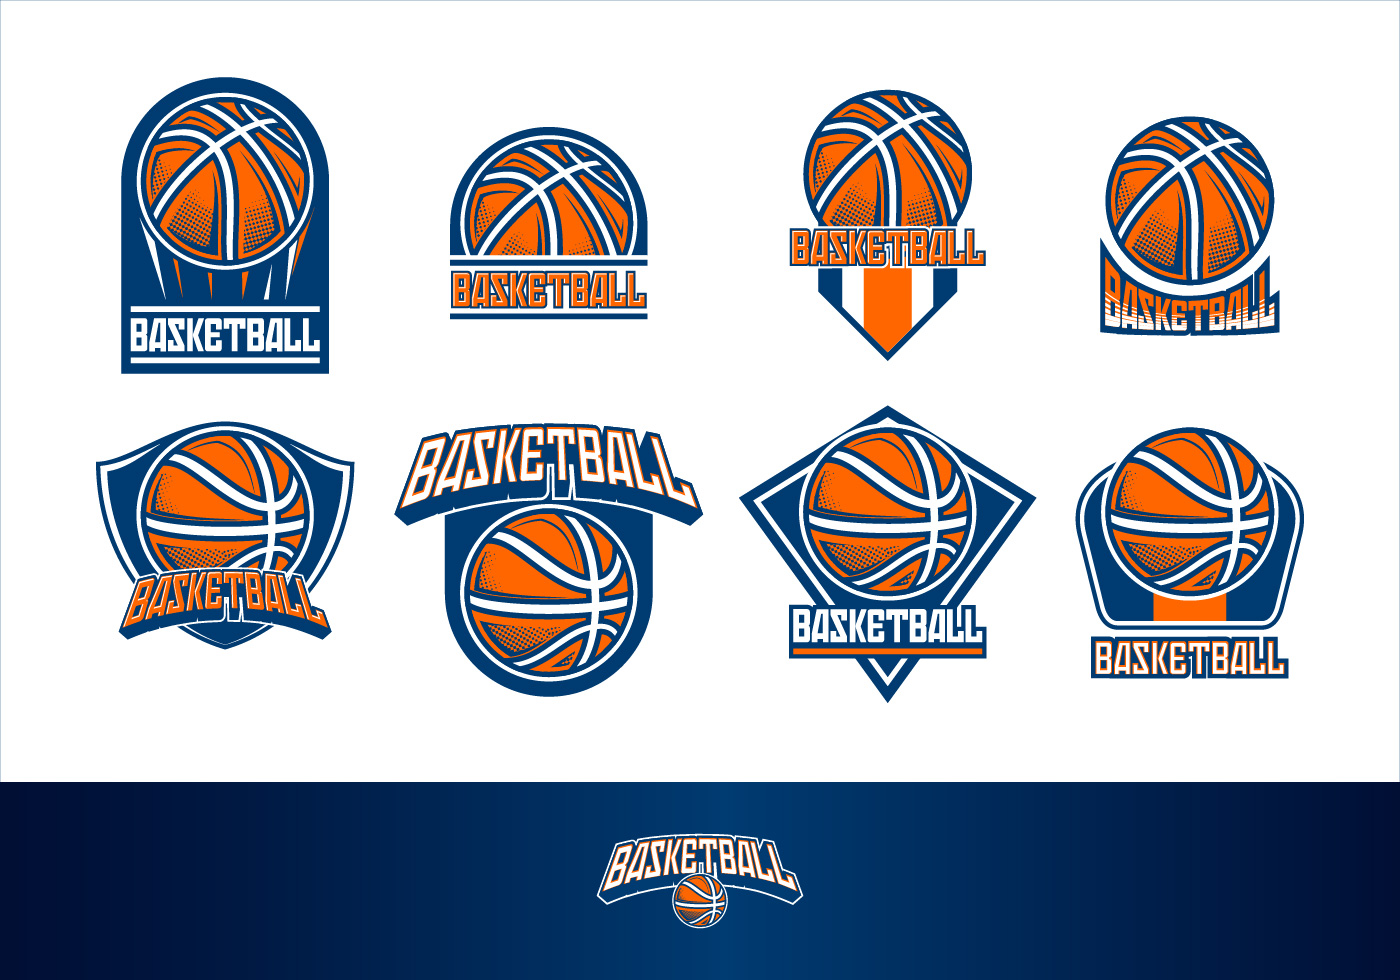 Basketball Logo Free Vector - Download Free Vector Art ... Basketball Logos Free